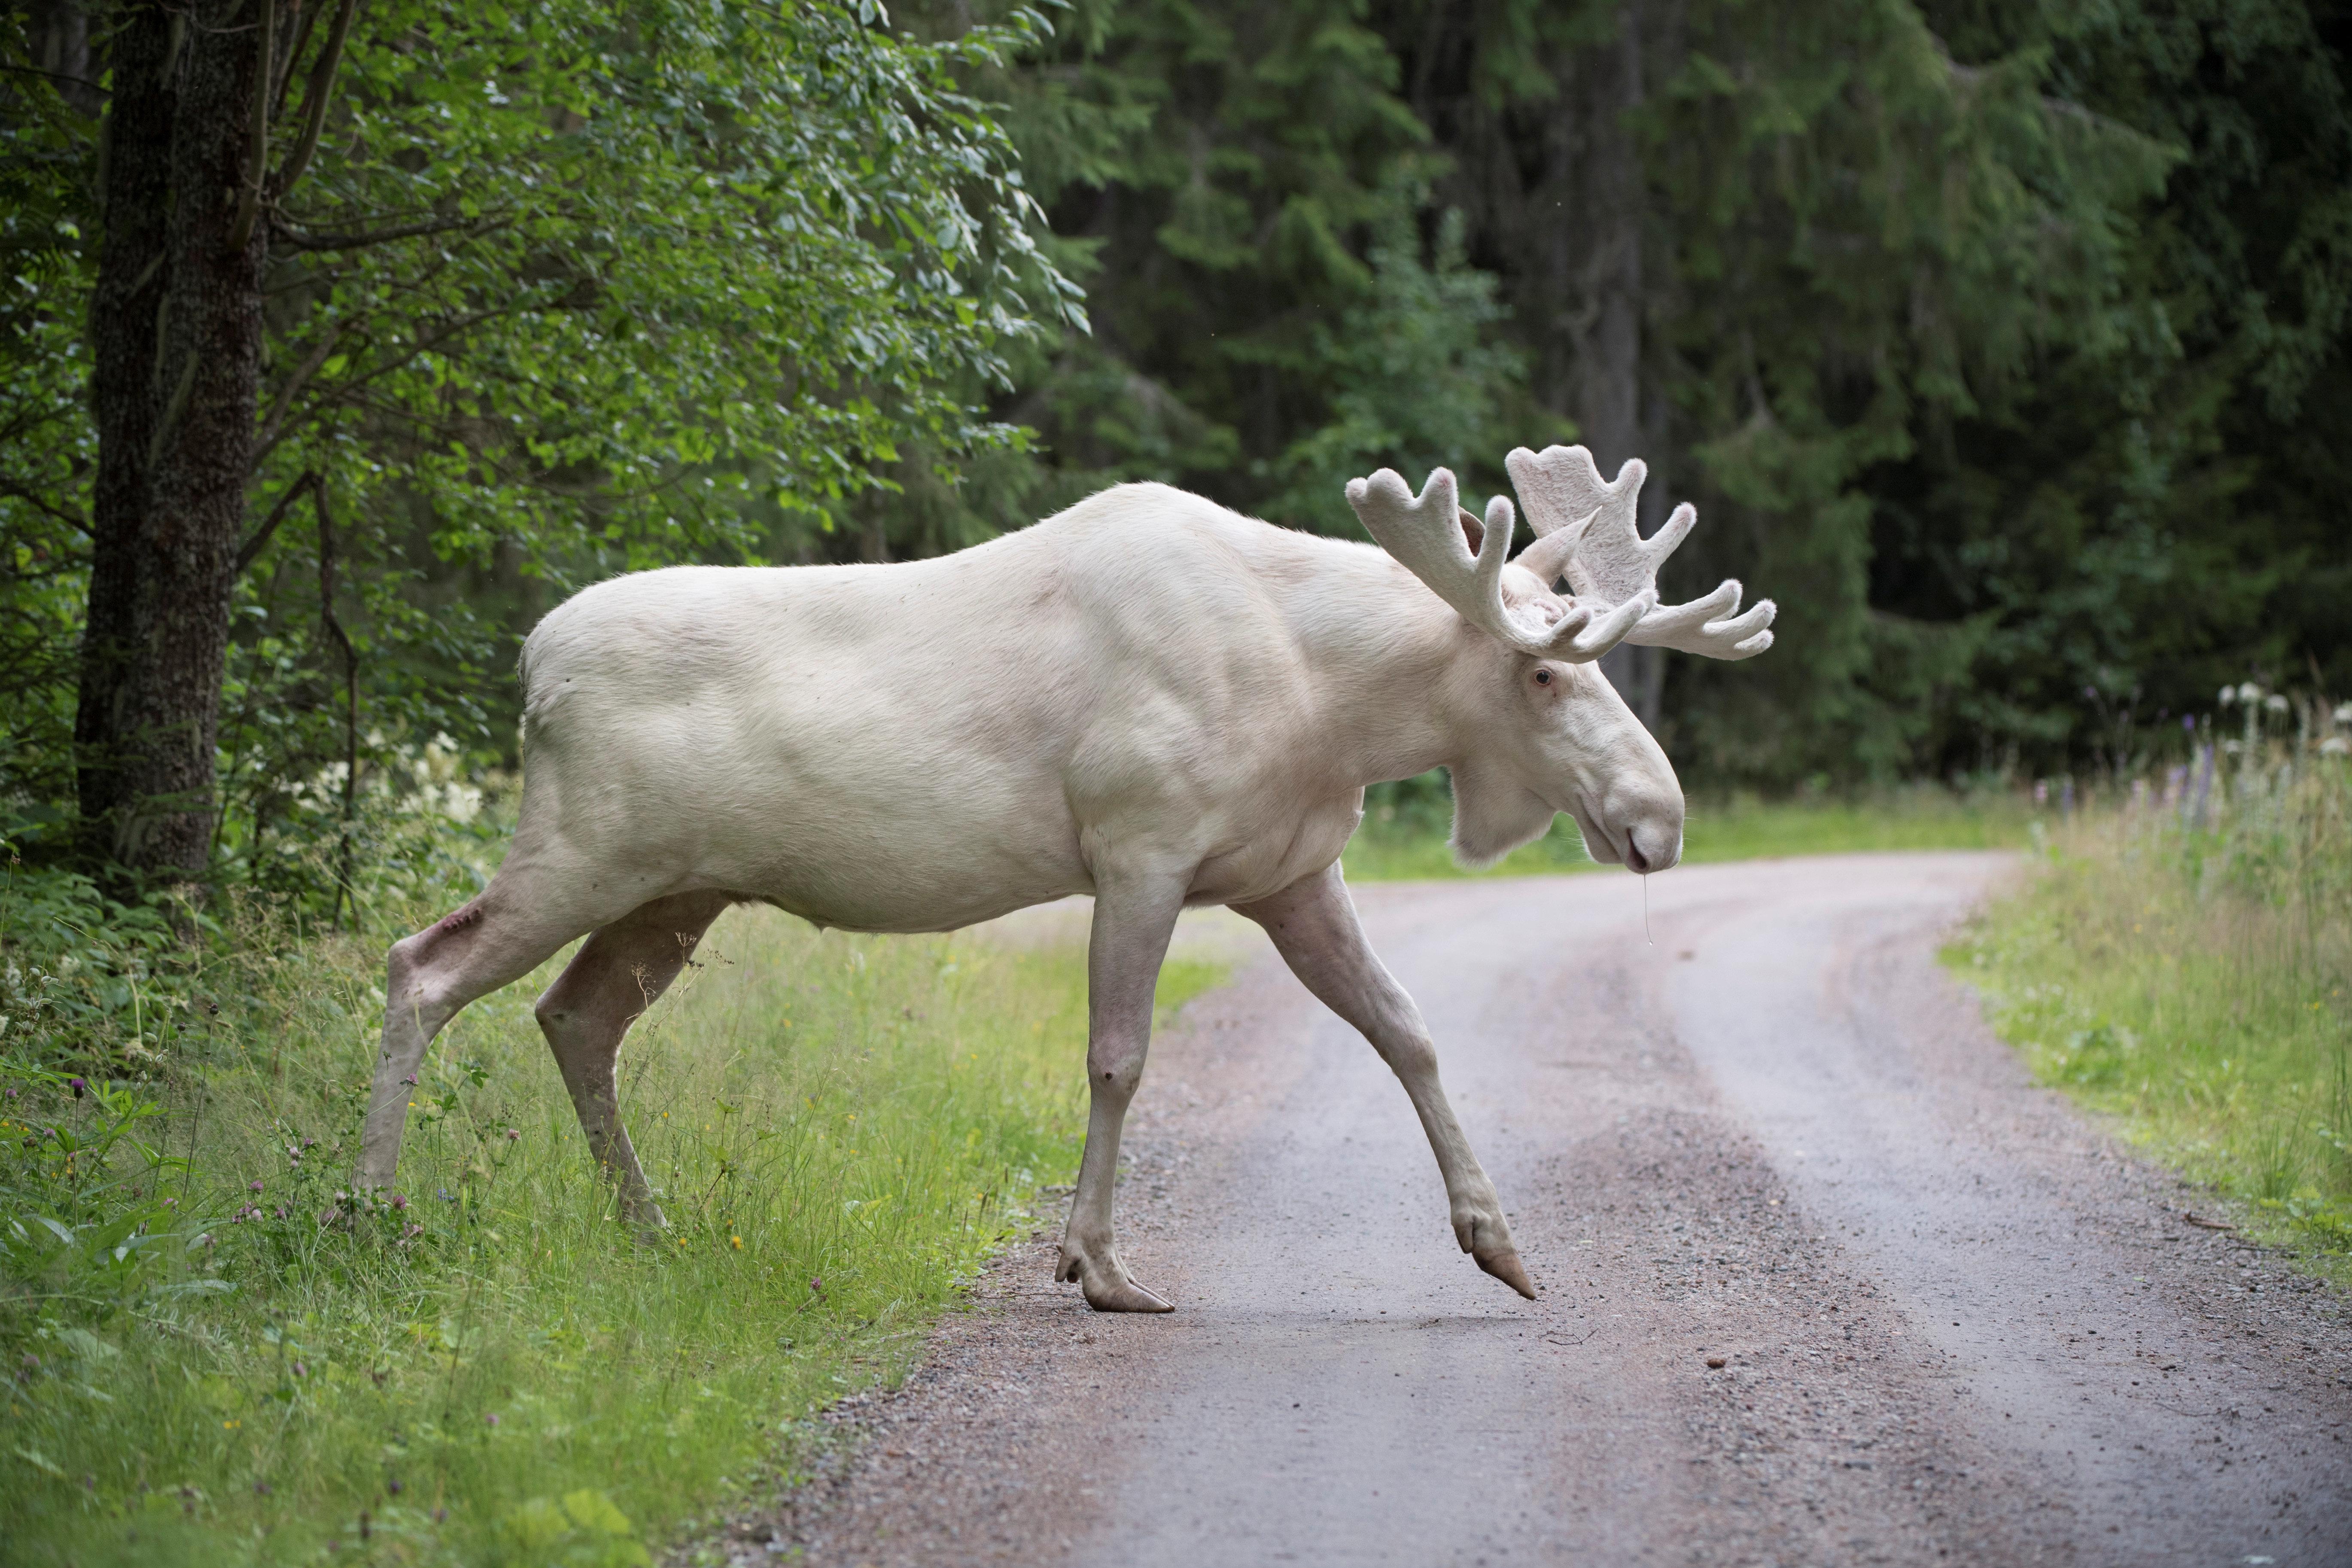 A rare white moose is seen in Gunnarskog, Varmland, Swedenon July